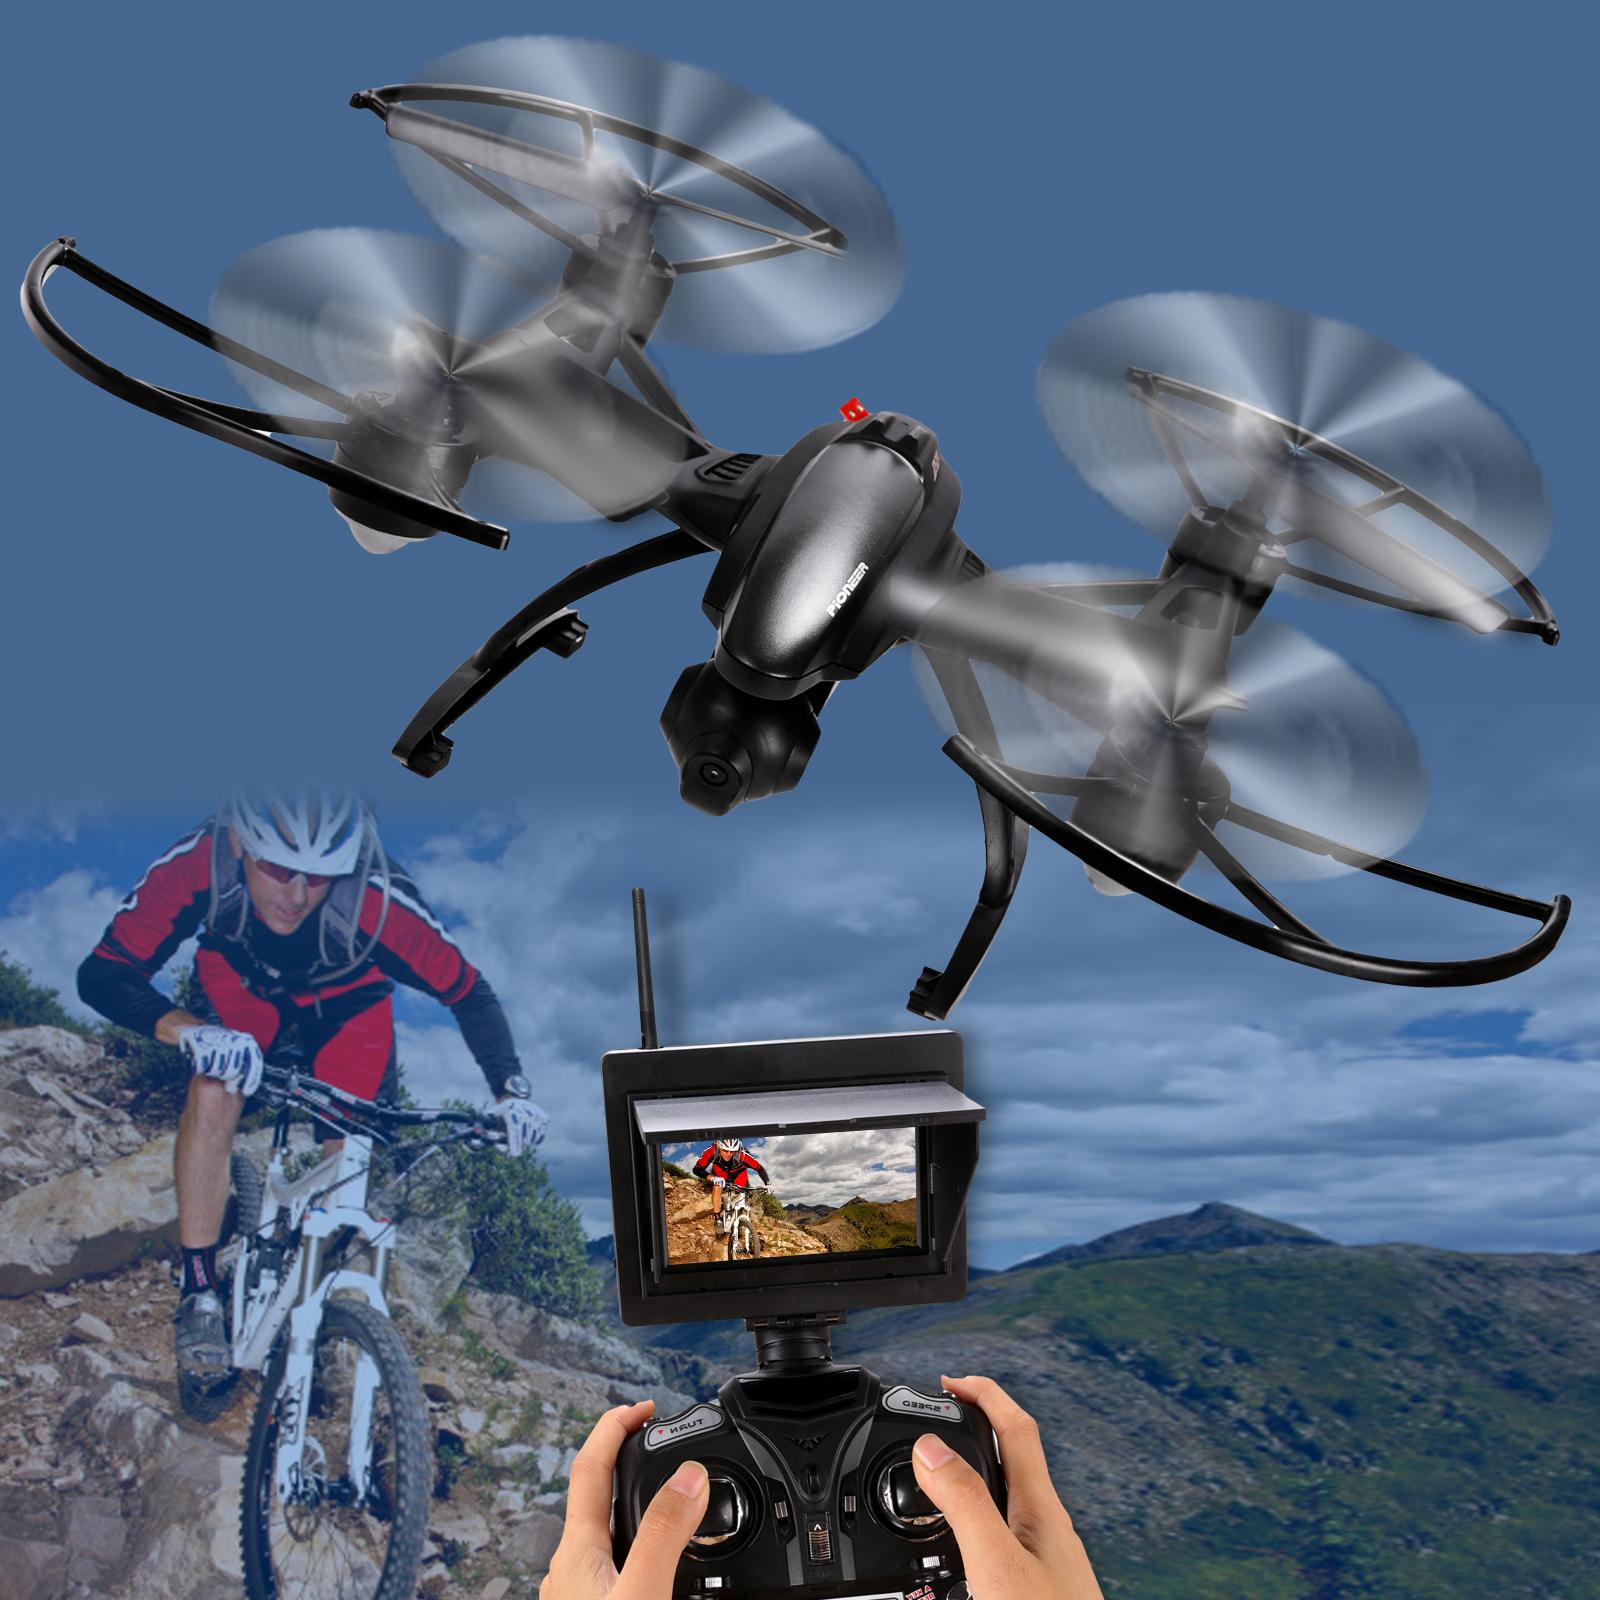 http://g01.a.alicdn.com/kf/HTB1dzfhLXXXXXbAXpXXq6xXFXXXp/-font-b-JXD-b-font-font-b-509G-b-font-JXD509G-RC-Quadcopter-Drone-5.jpg